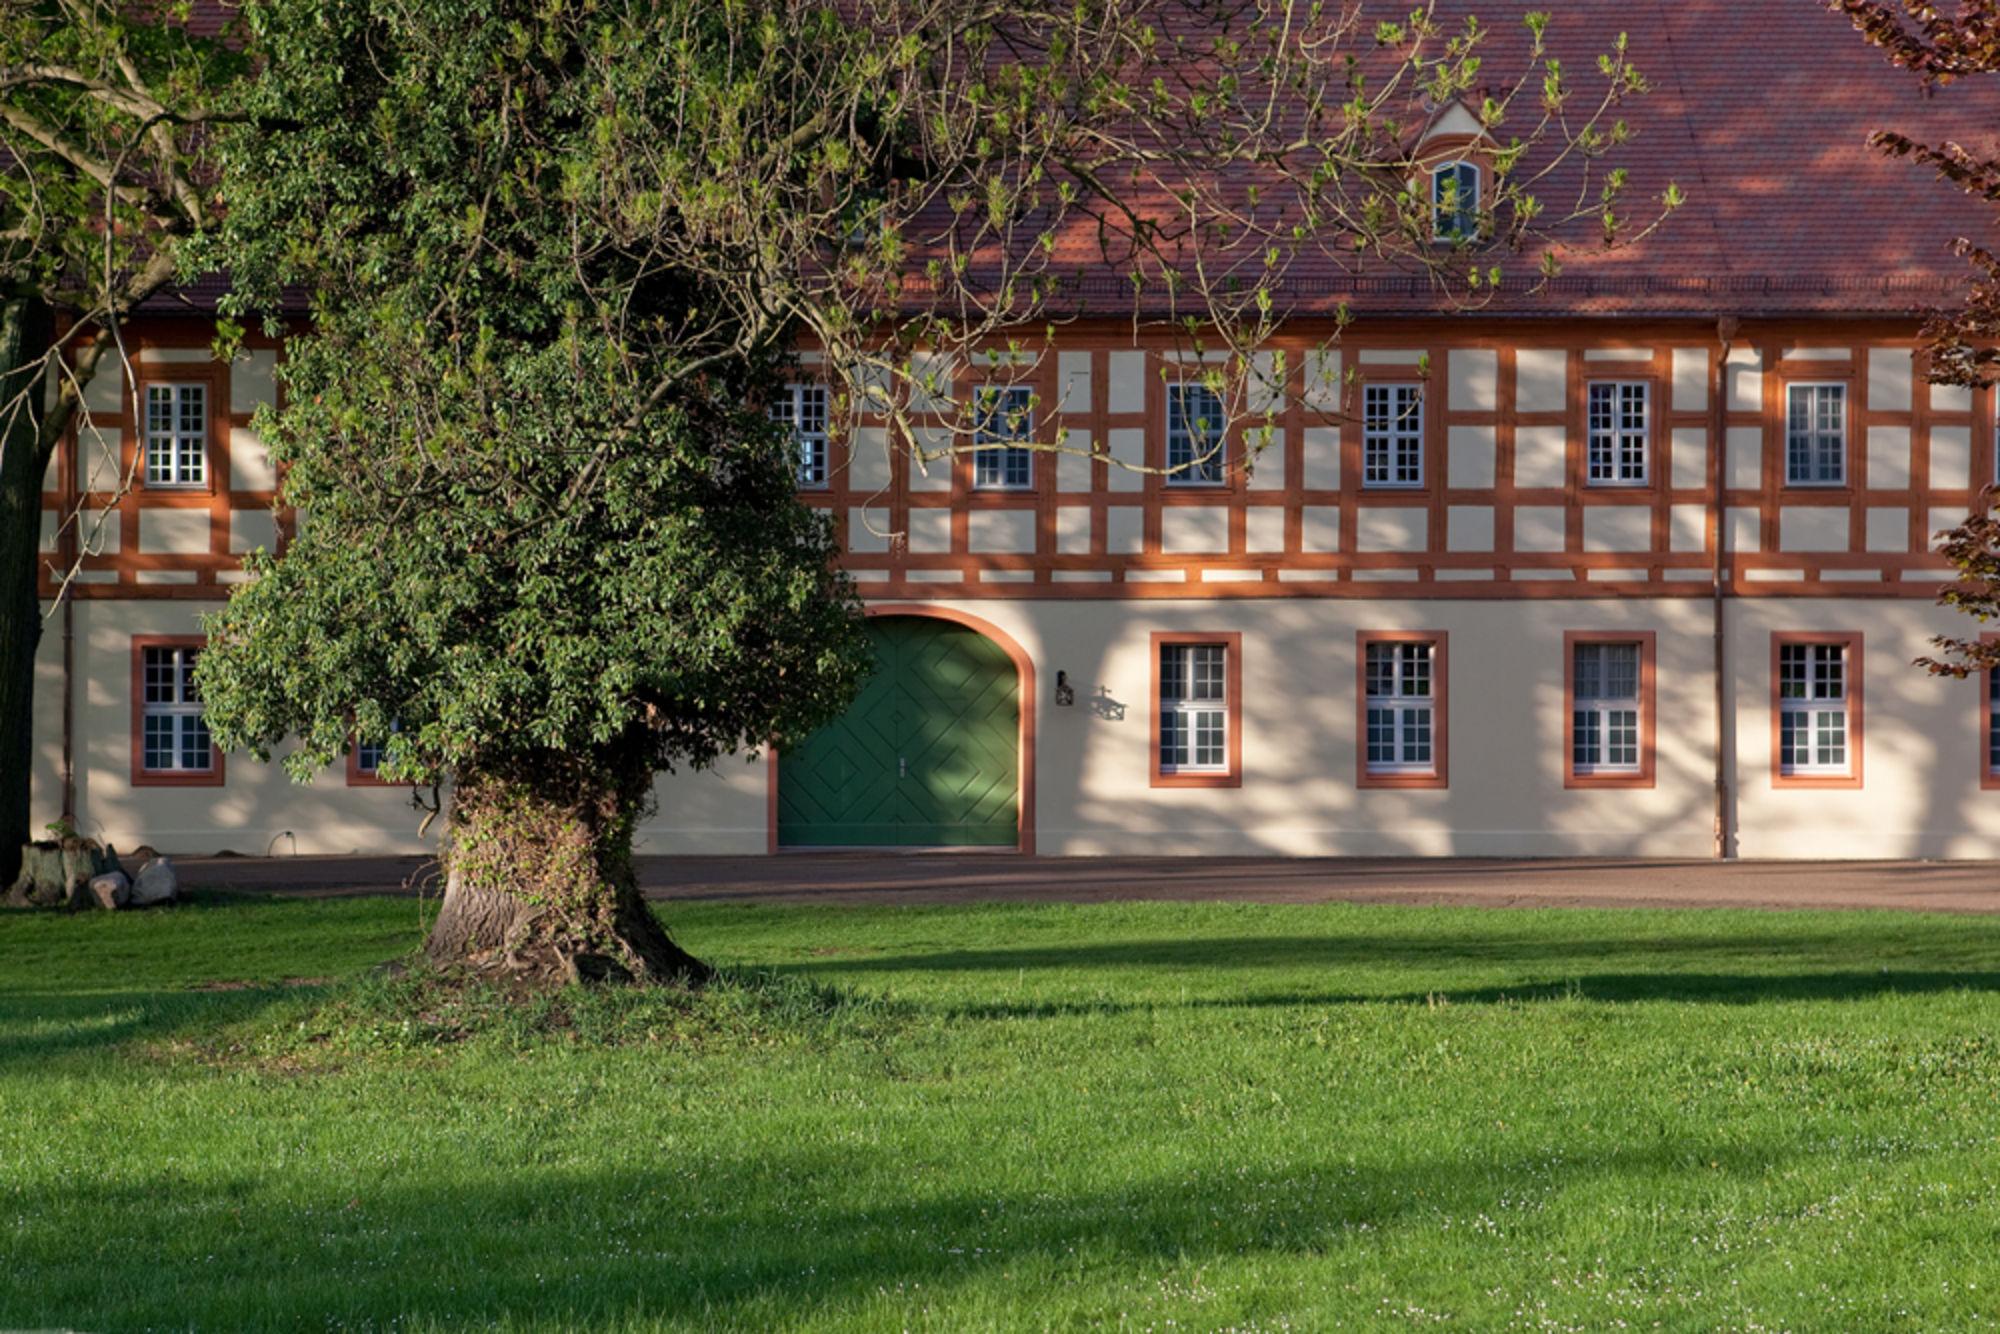 Urlaub Spreewald - Marstall - Die Urlaubsresidenz im Spreewald - Schloss Lübbenau im Spreewald